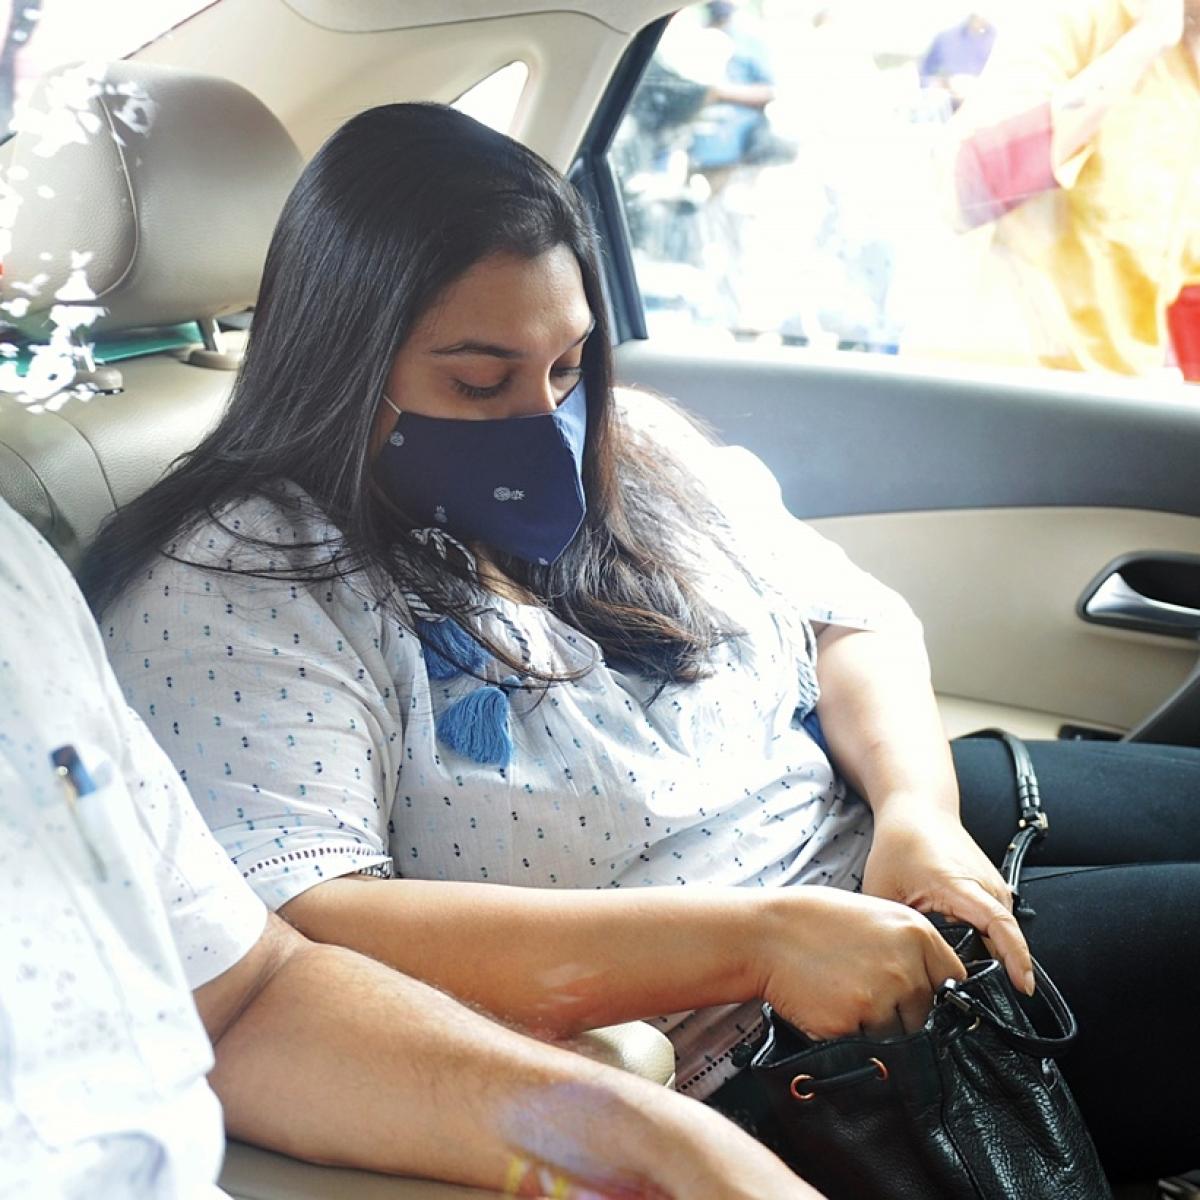 Sushant Singh Rajput case: Talent manager Jaya Saha, Shruti Modi asked to join NCB probe